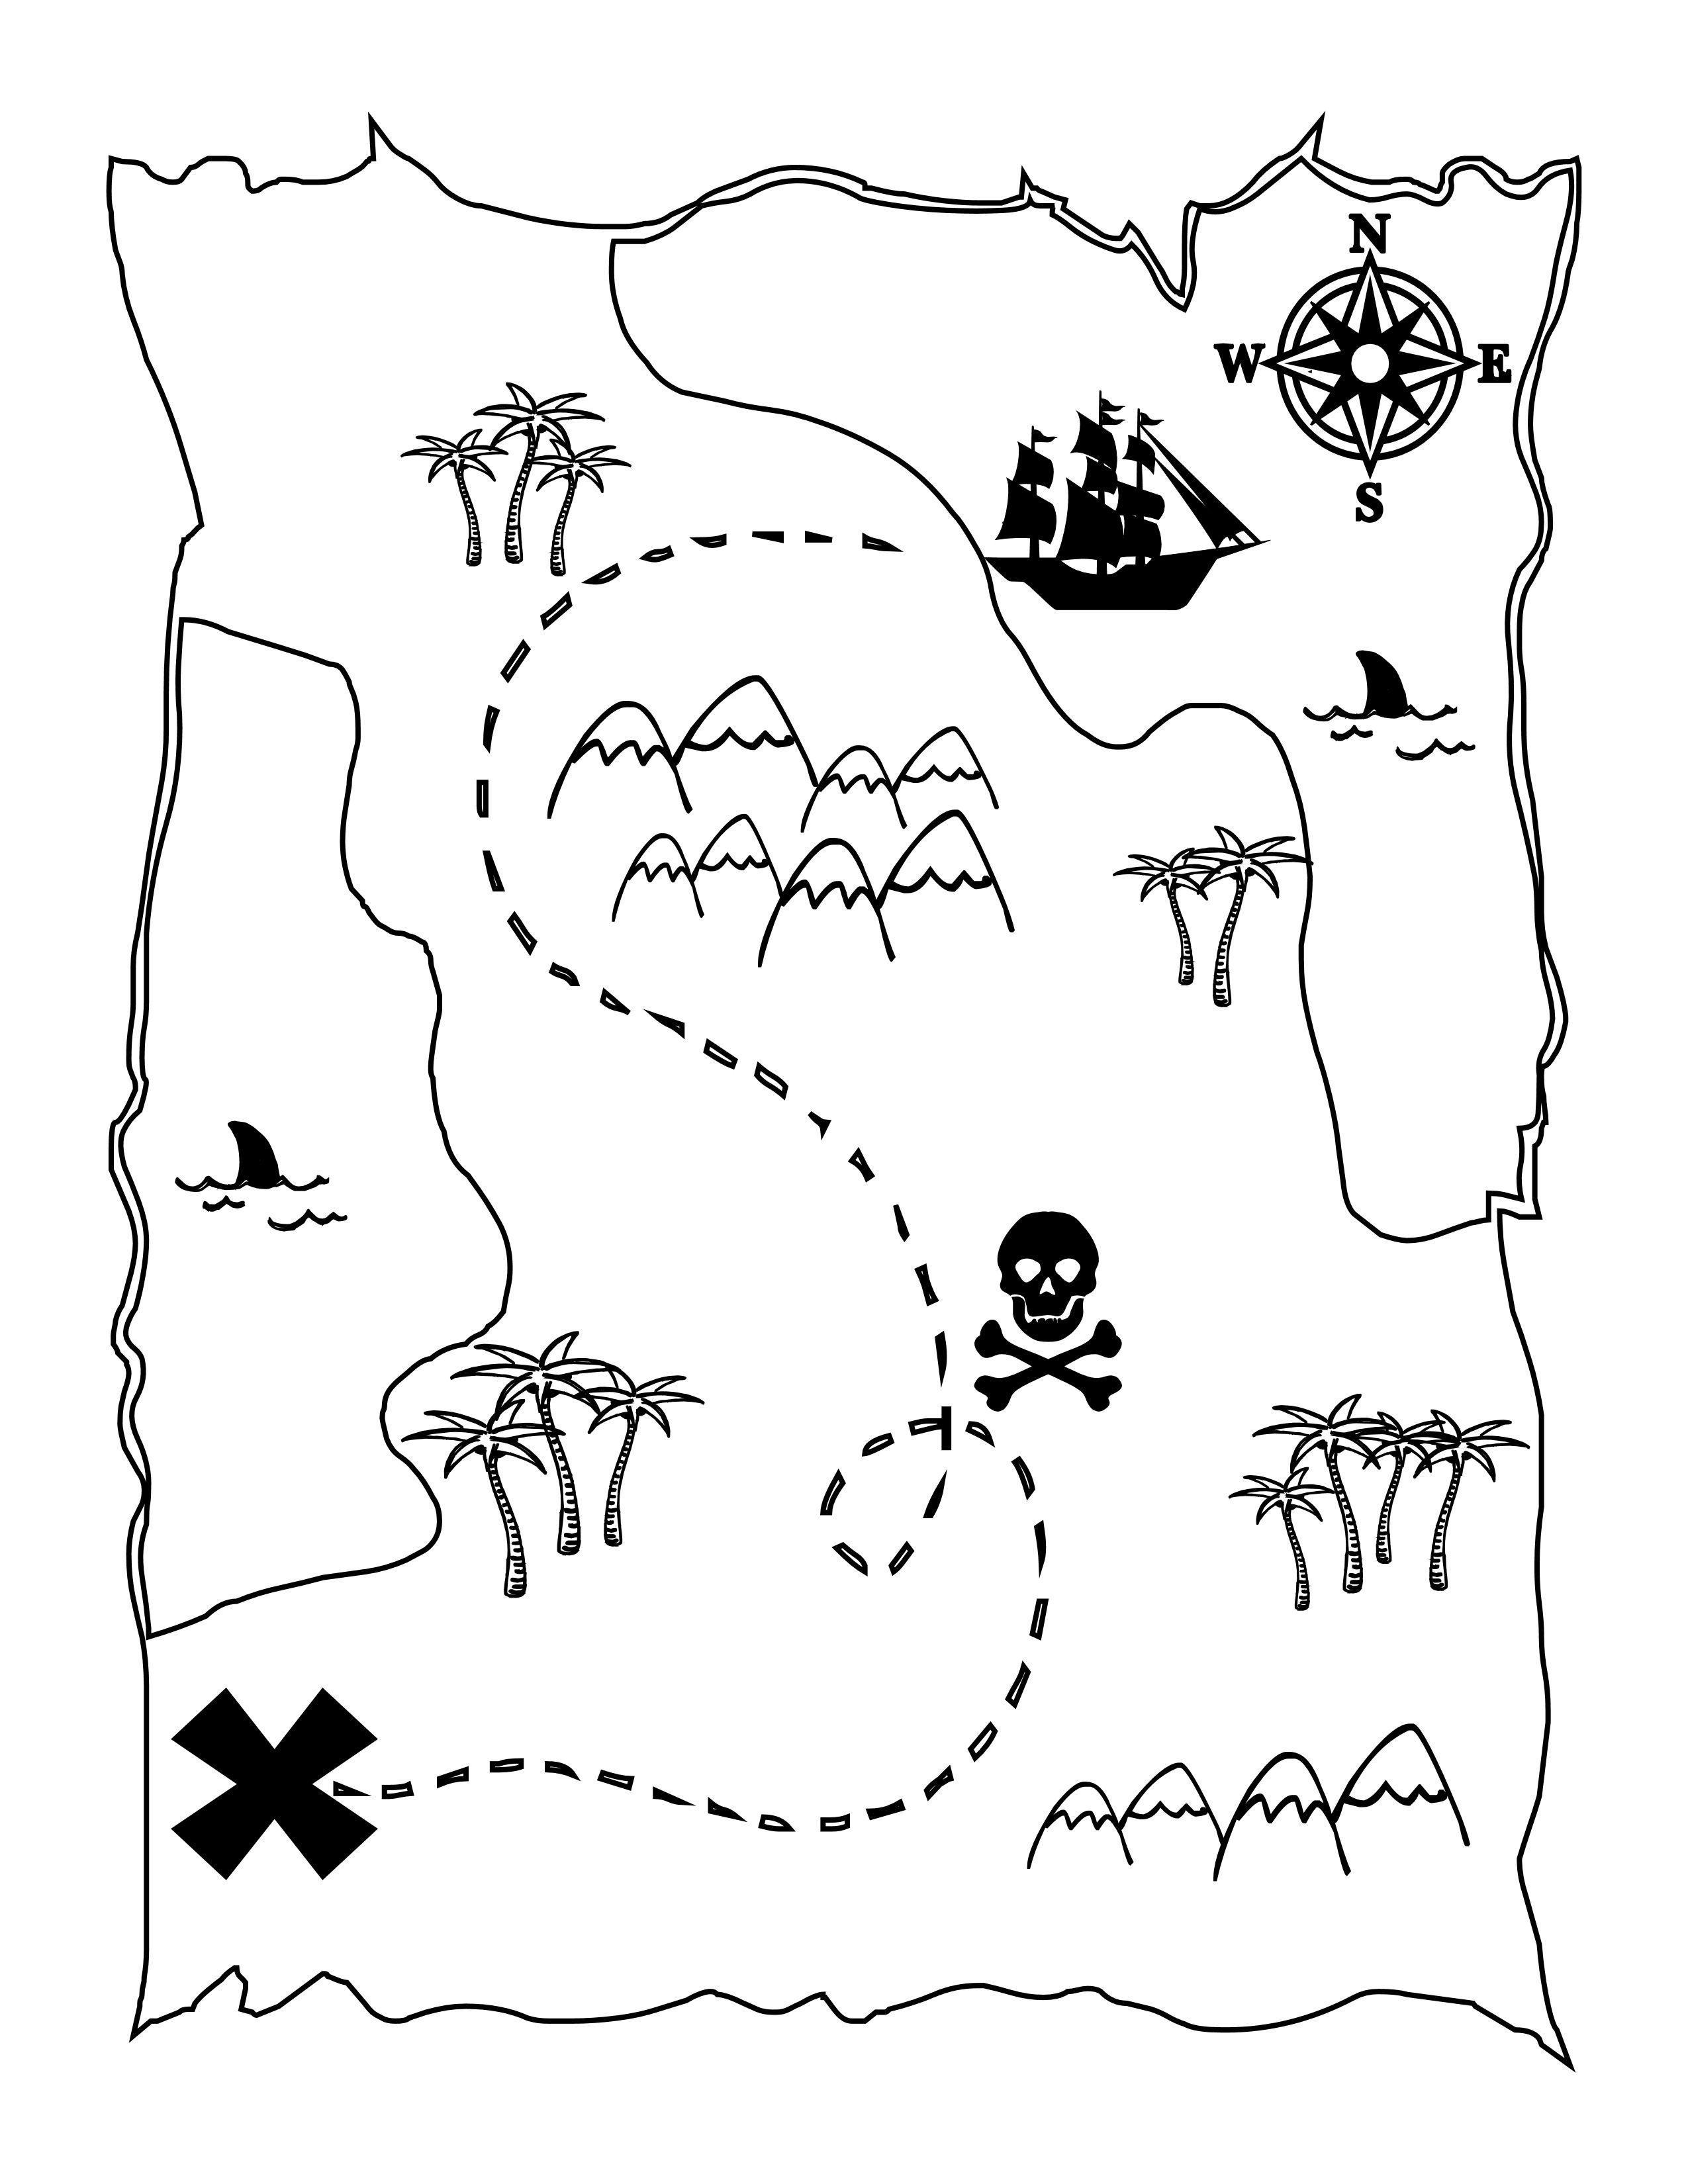 Printable Treasure Map Kids Activity   Printables   Pirate Maps - Free Printable Pirate Maps